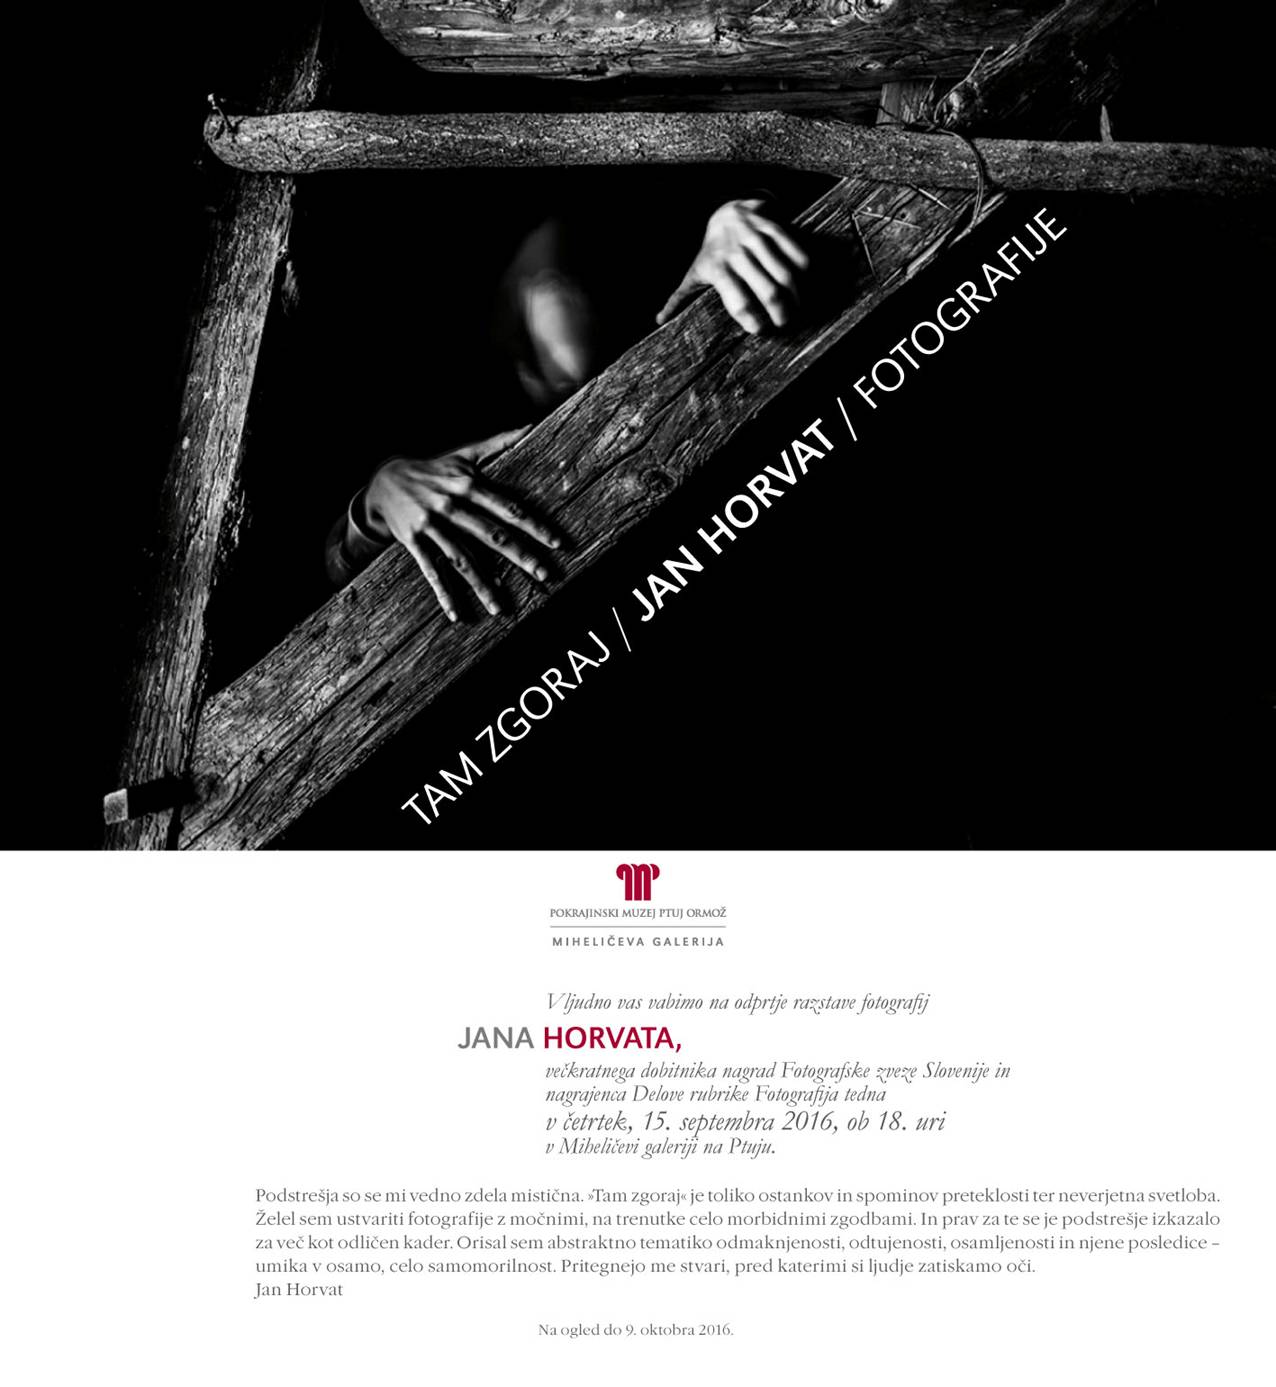 Jan Horvat – Tam zgoraj